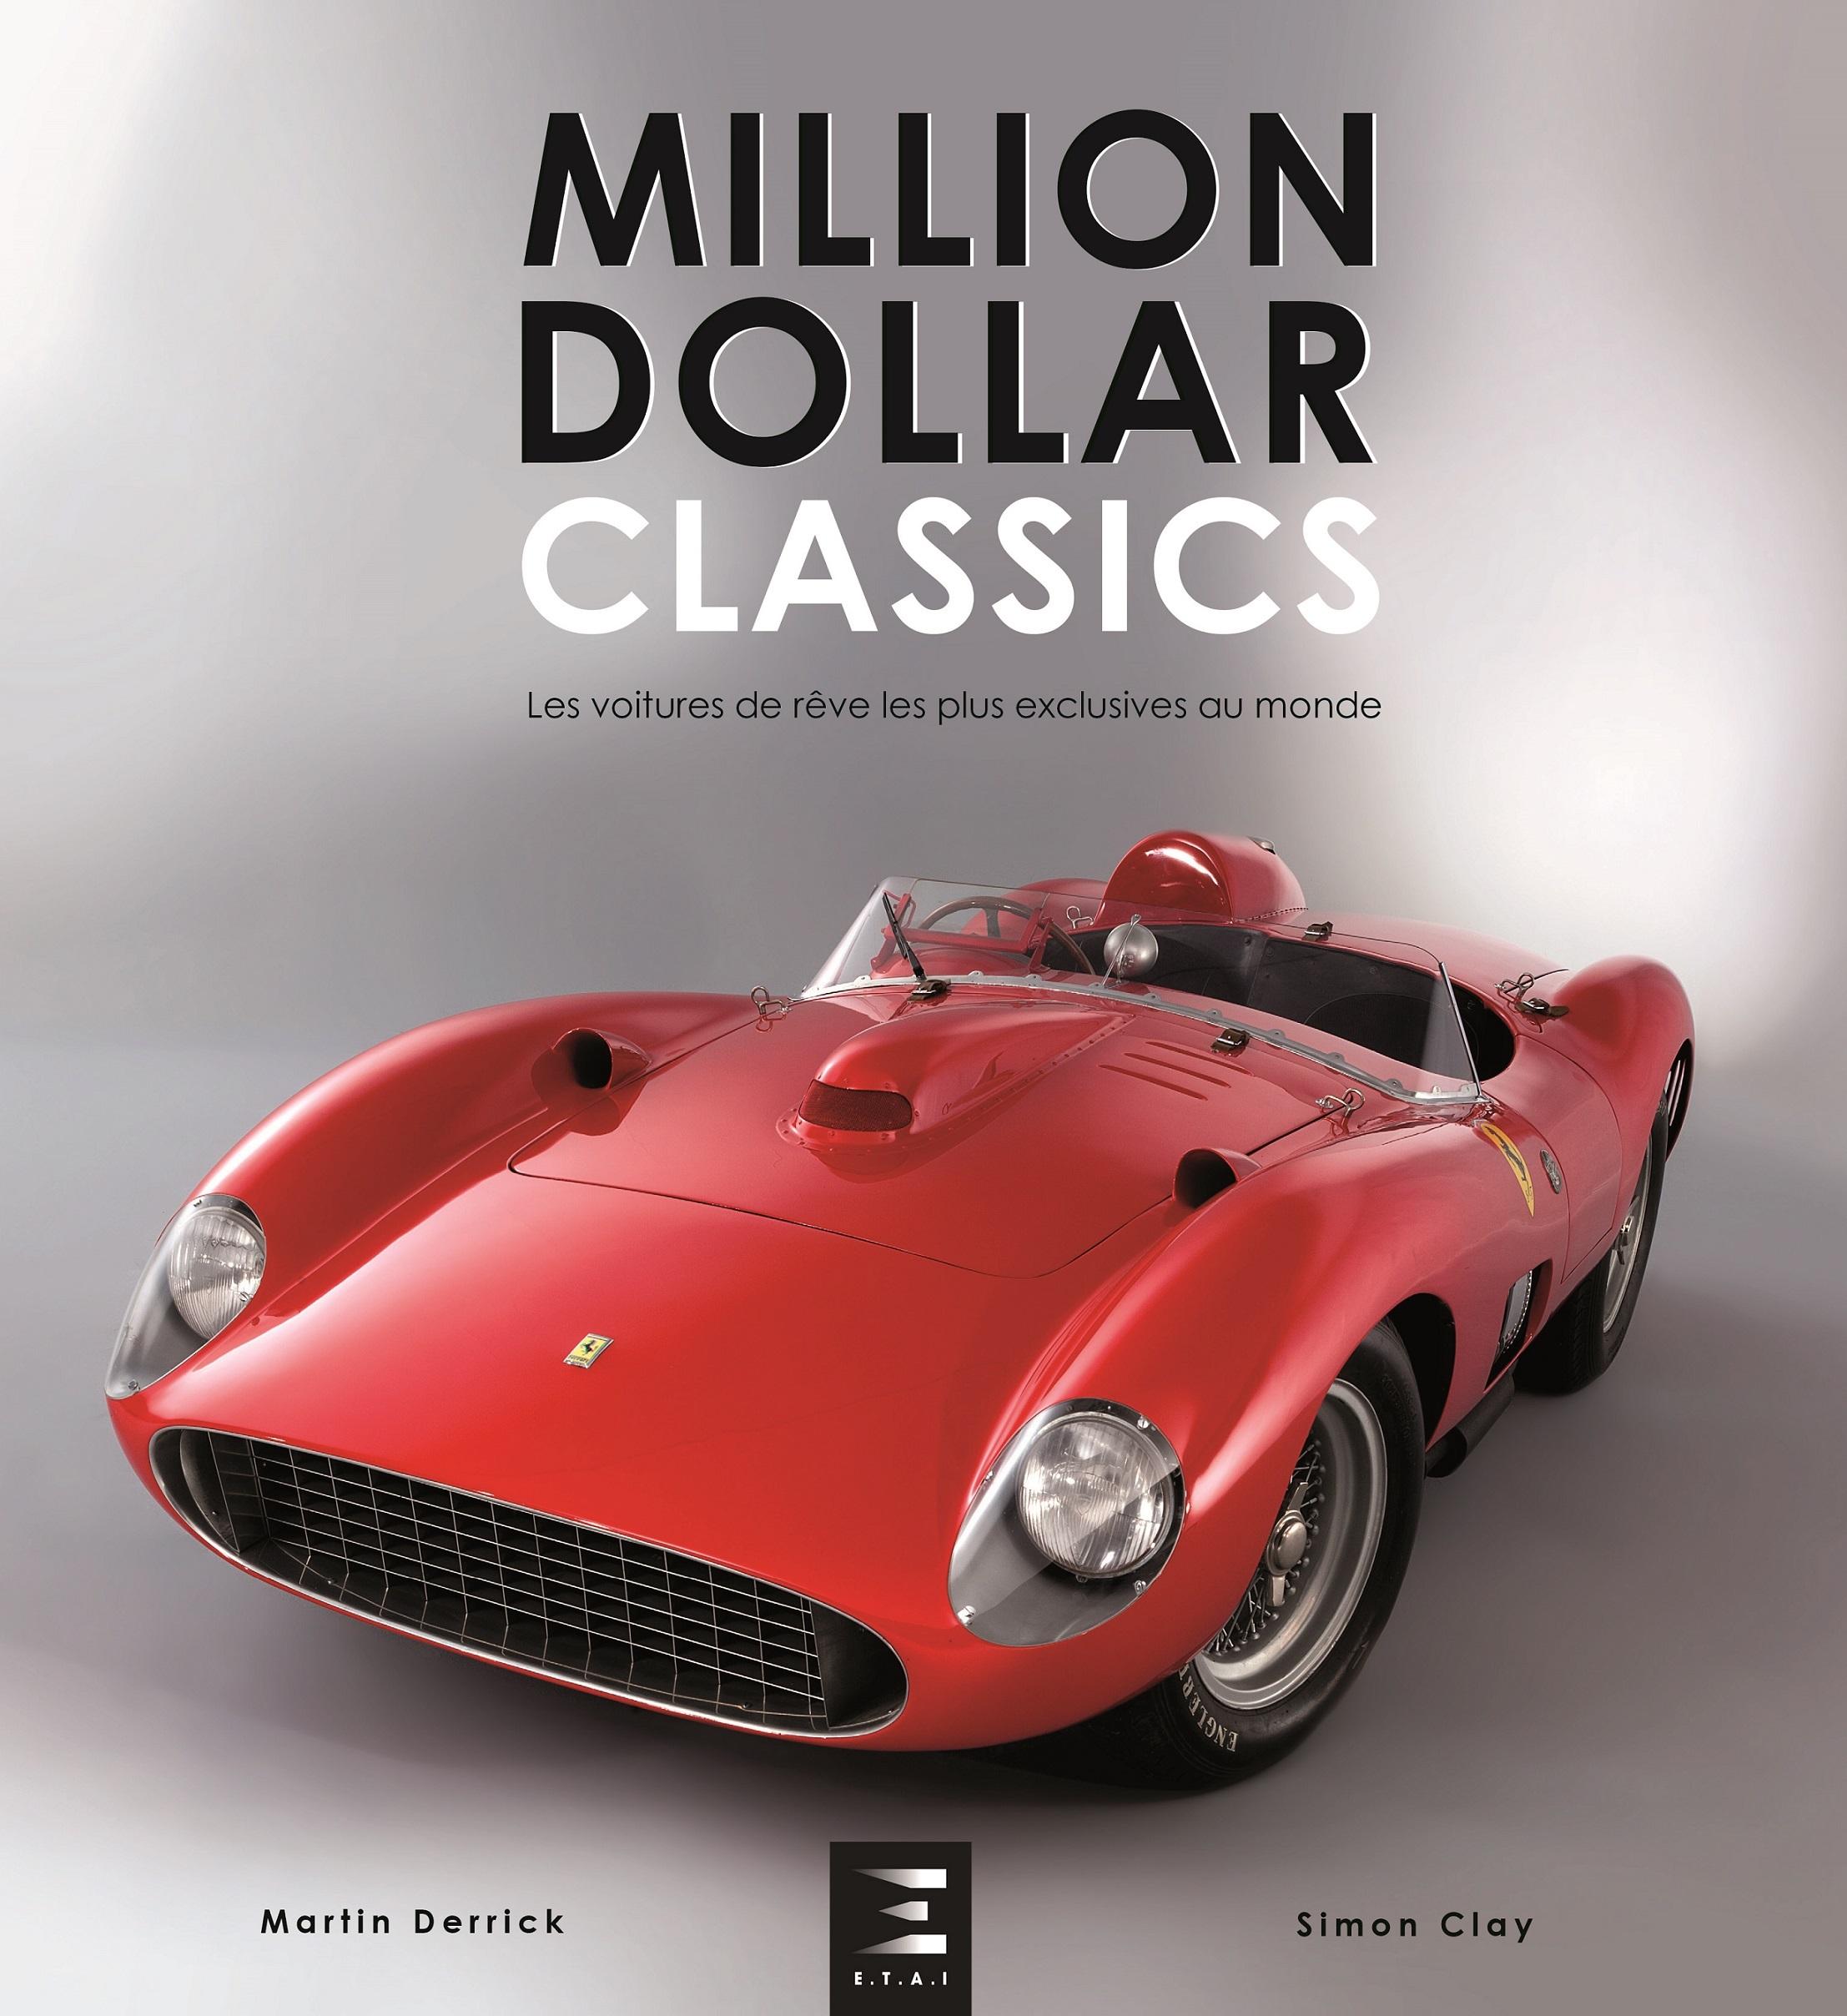 MILLION DOLLAR CLASSICS